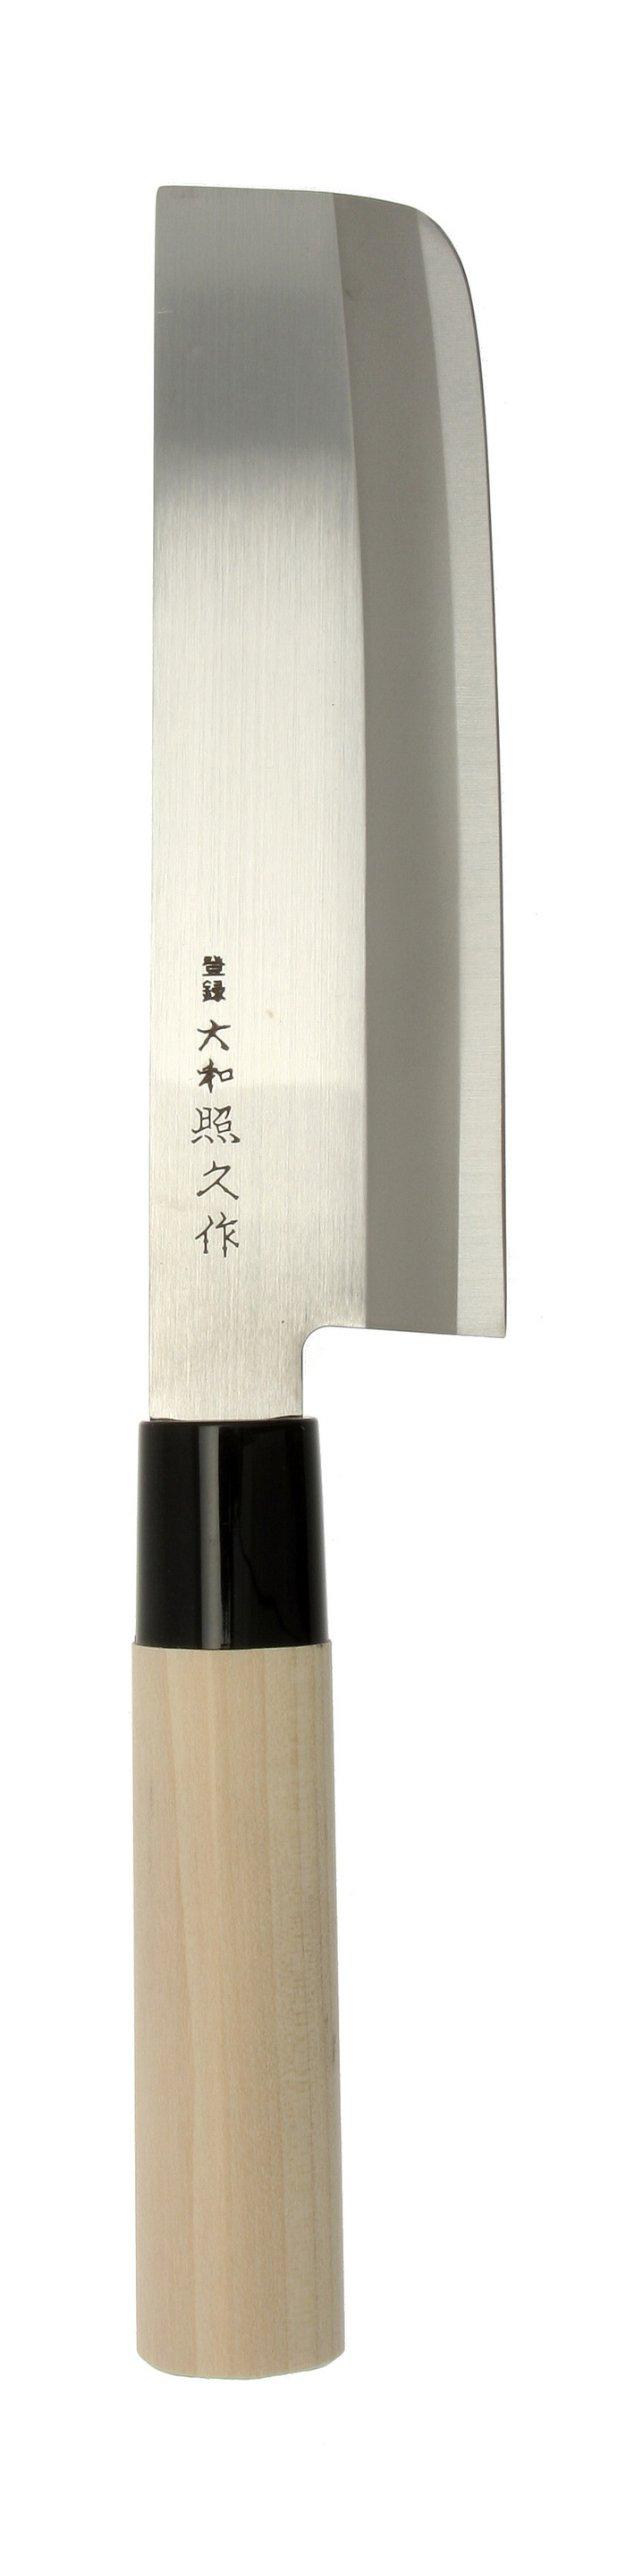 Kotobuki Teruhisa Nakiri Japanese Kitchen Knife by Kotobuki